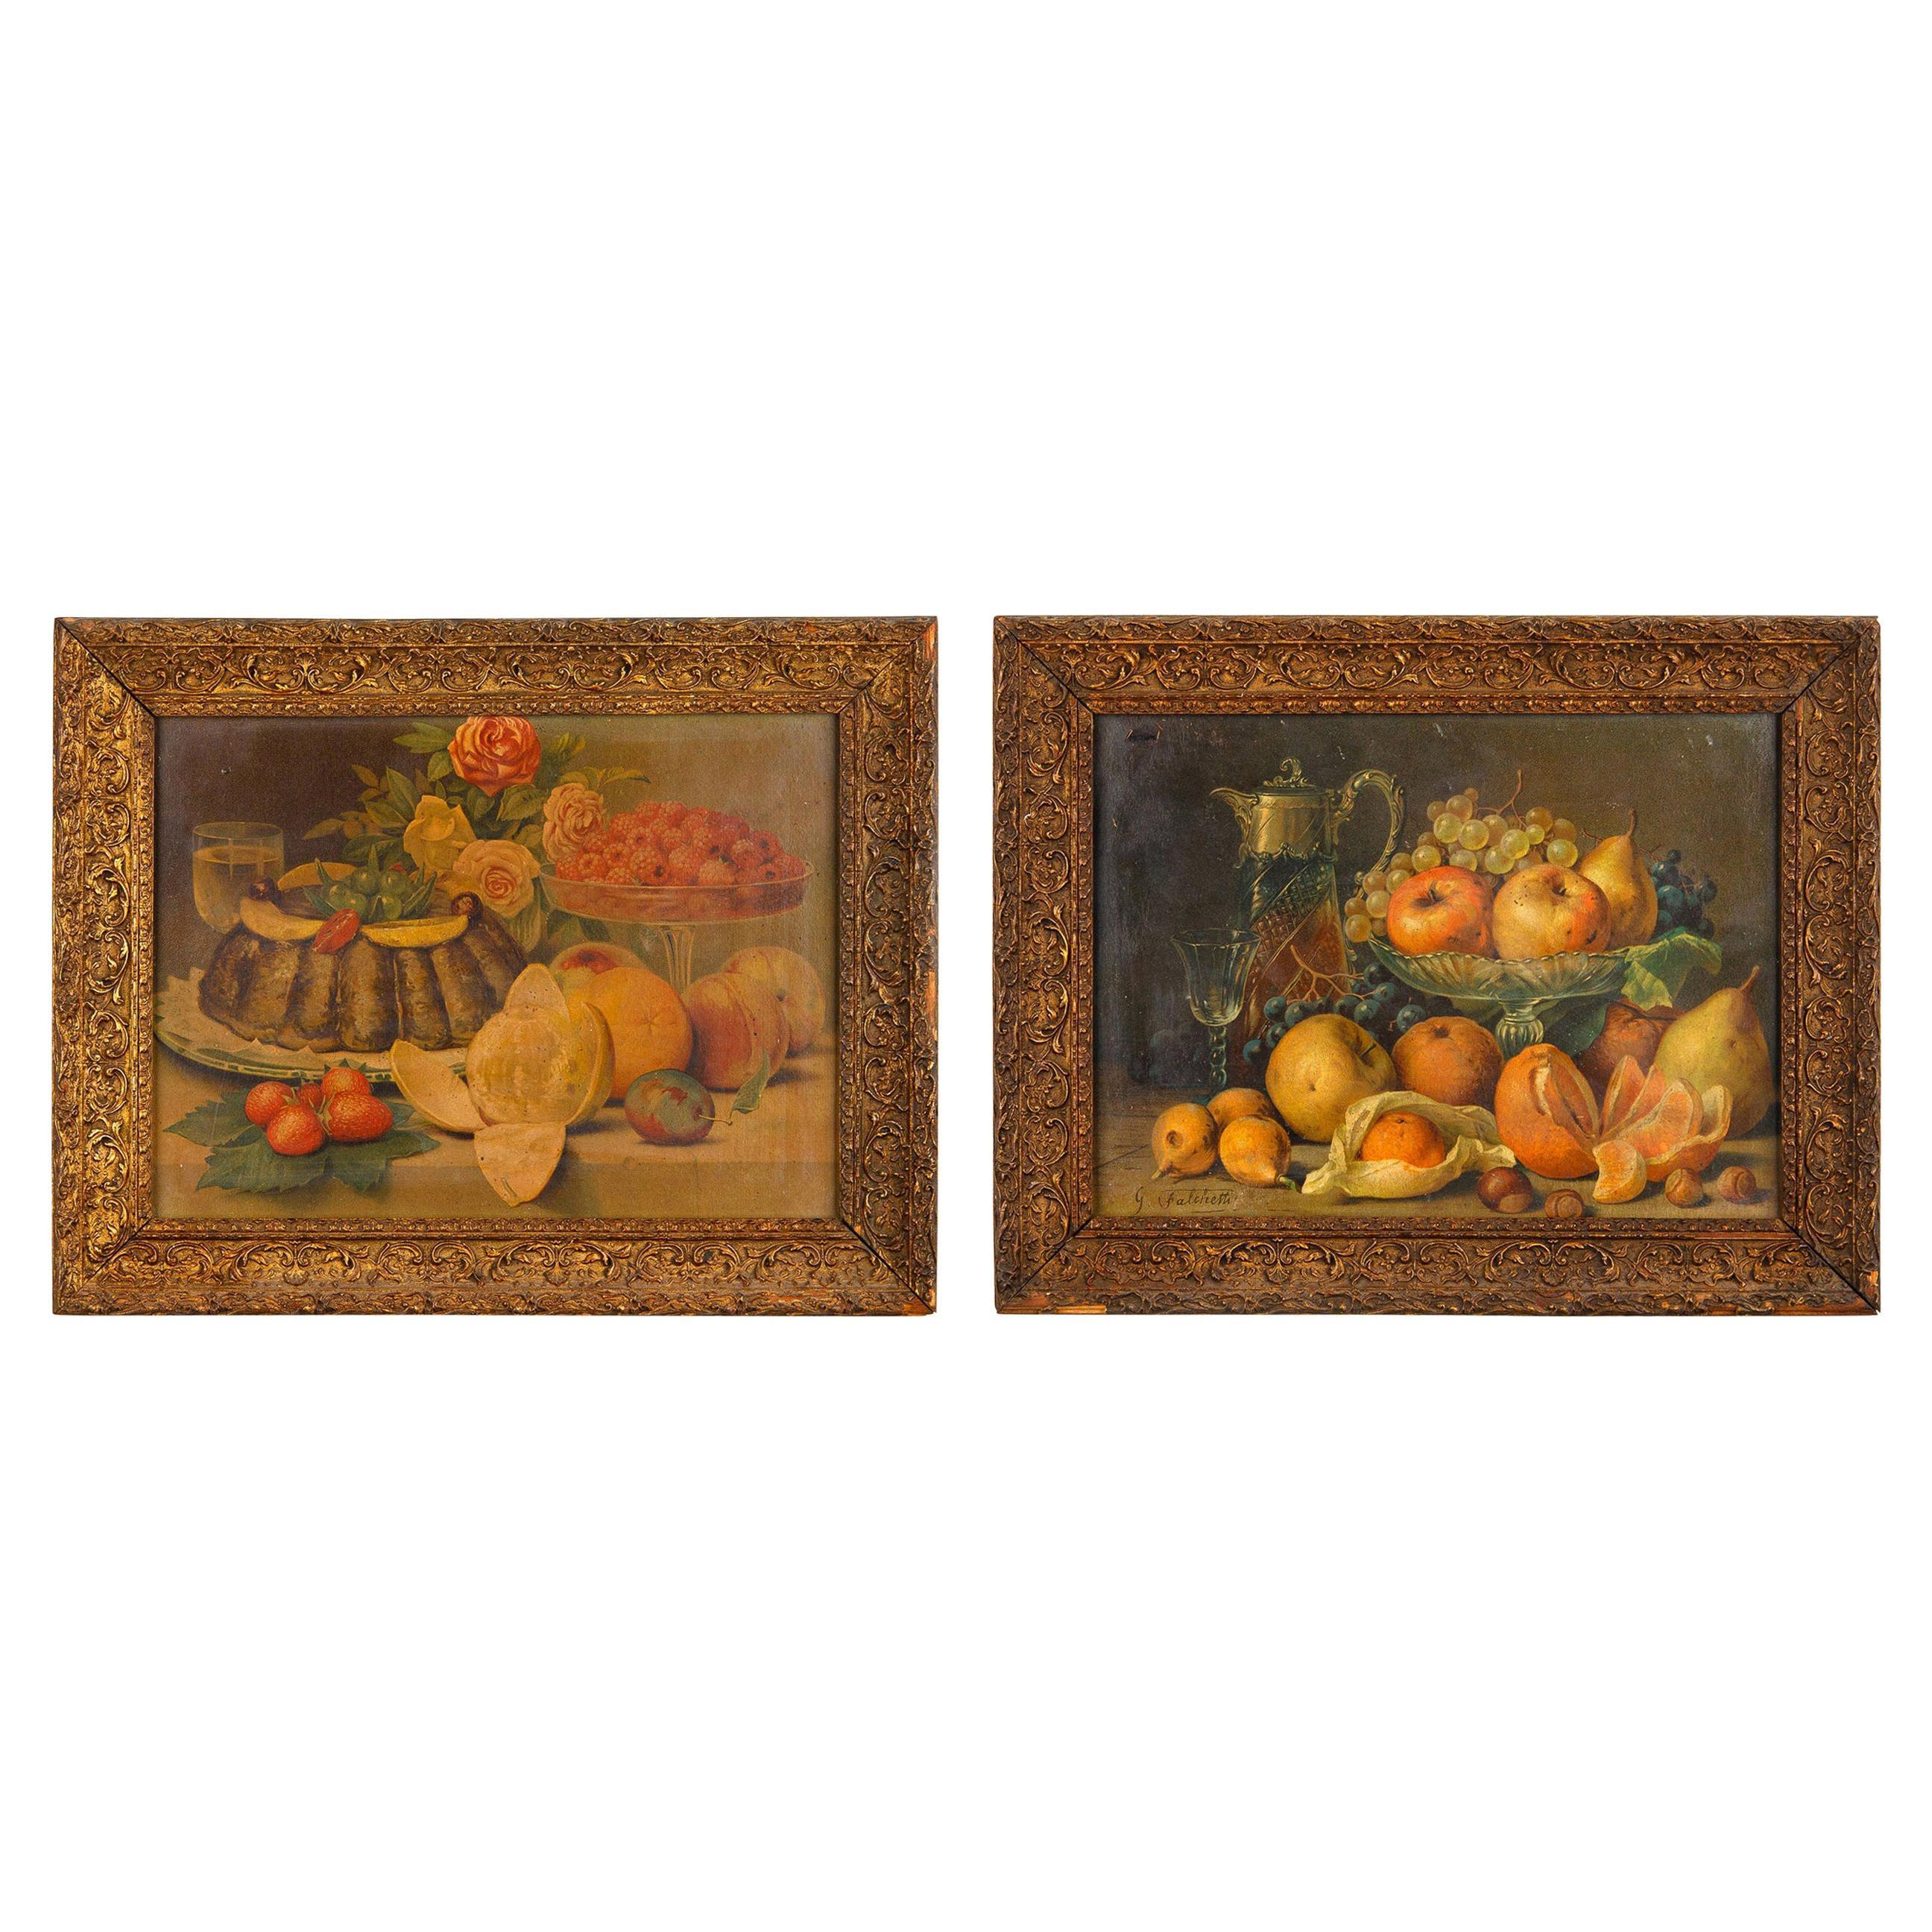 Pair of Framed Still Life Lithographs from Giuseppe Falchetti, Italy, 1900s